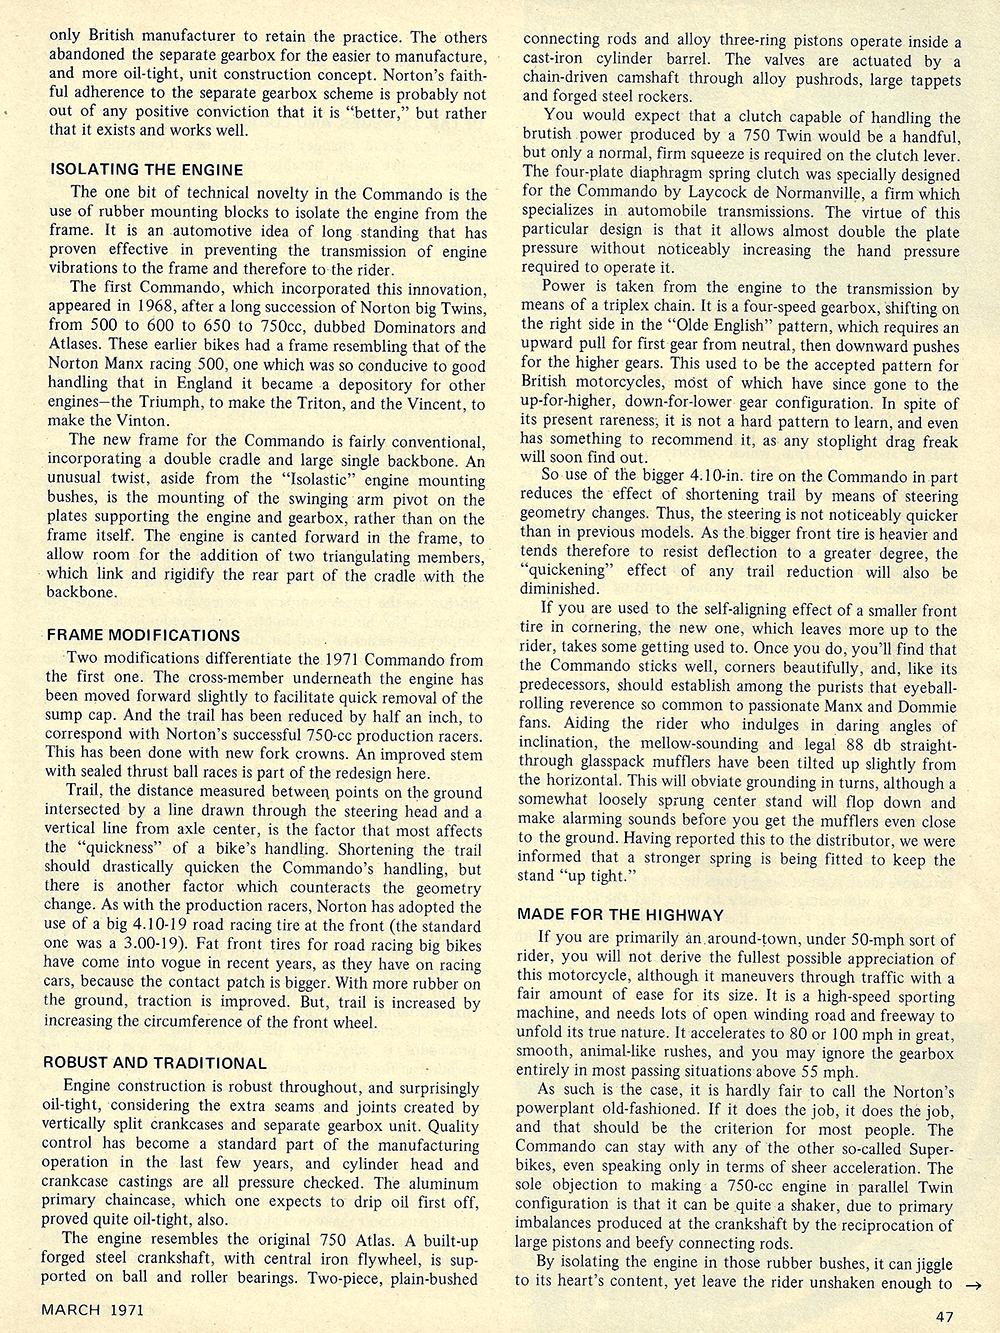 1971 Norton 750 Commando Fastback road test 02.jpg